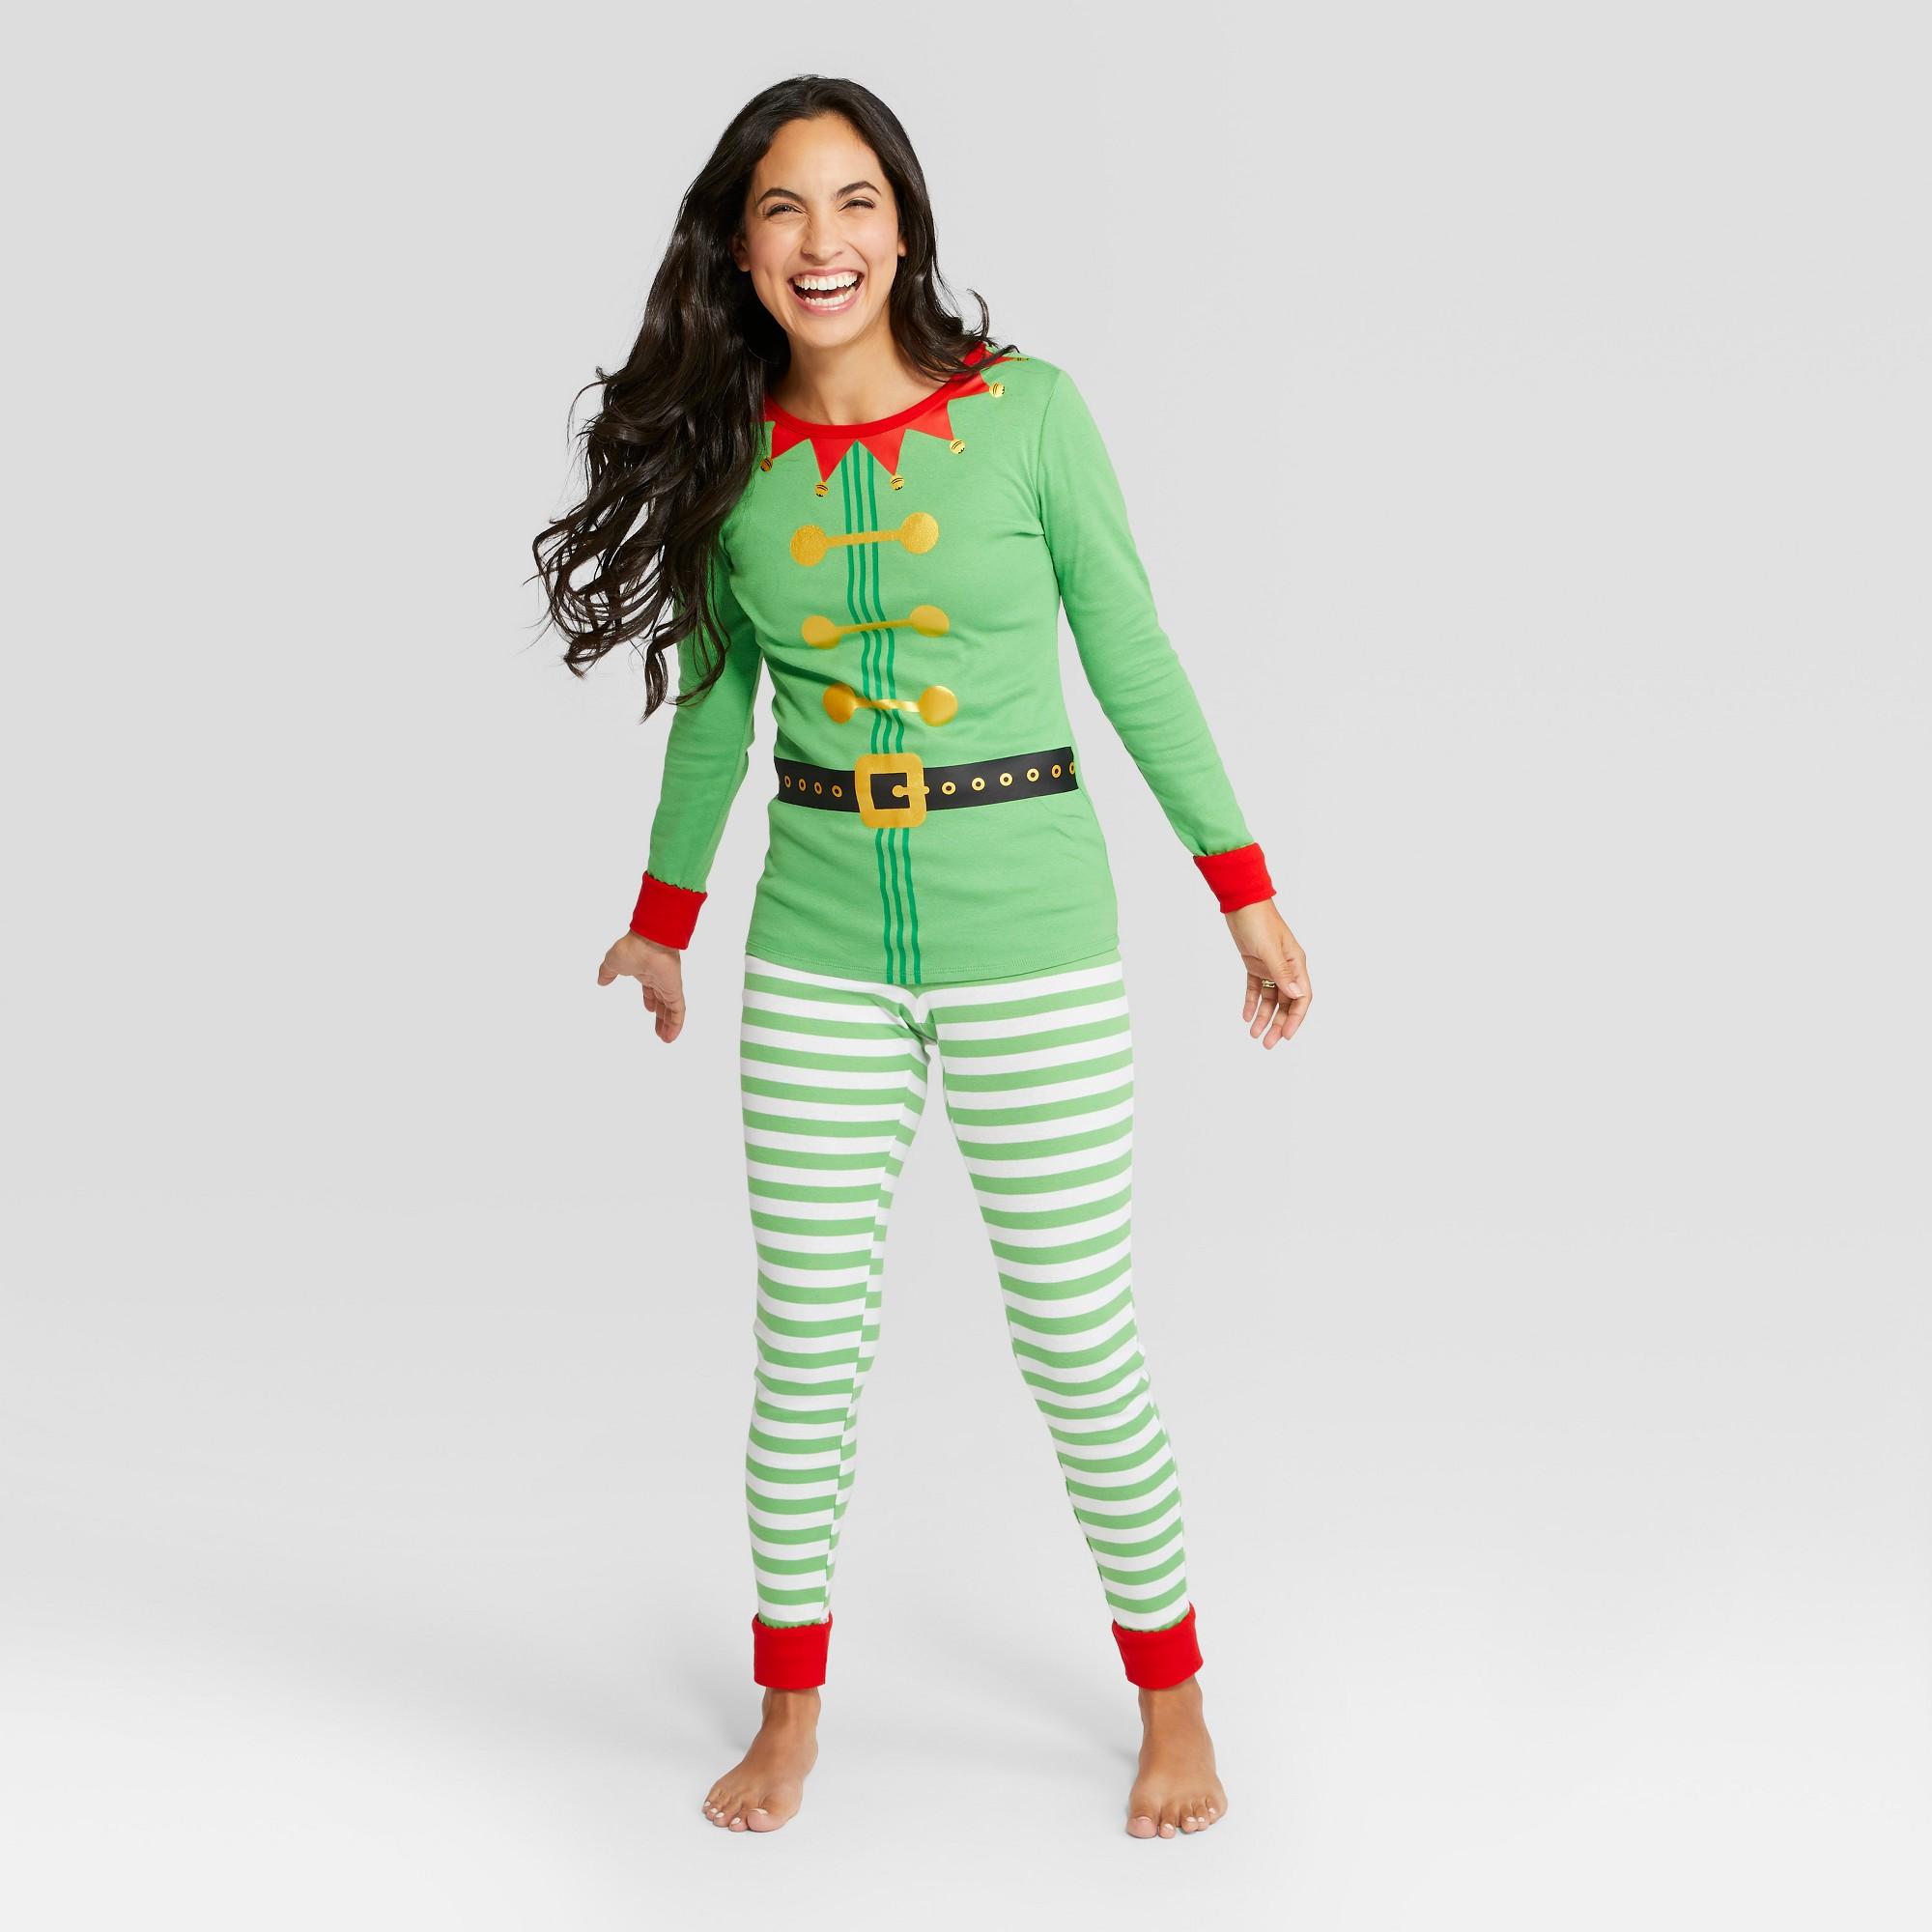 2b0e472bf7 Women s Holiday Elf Pajama Set - Wondershop Green S